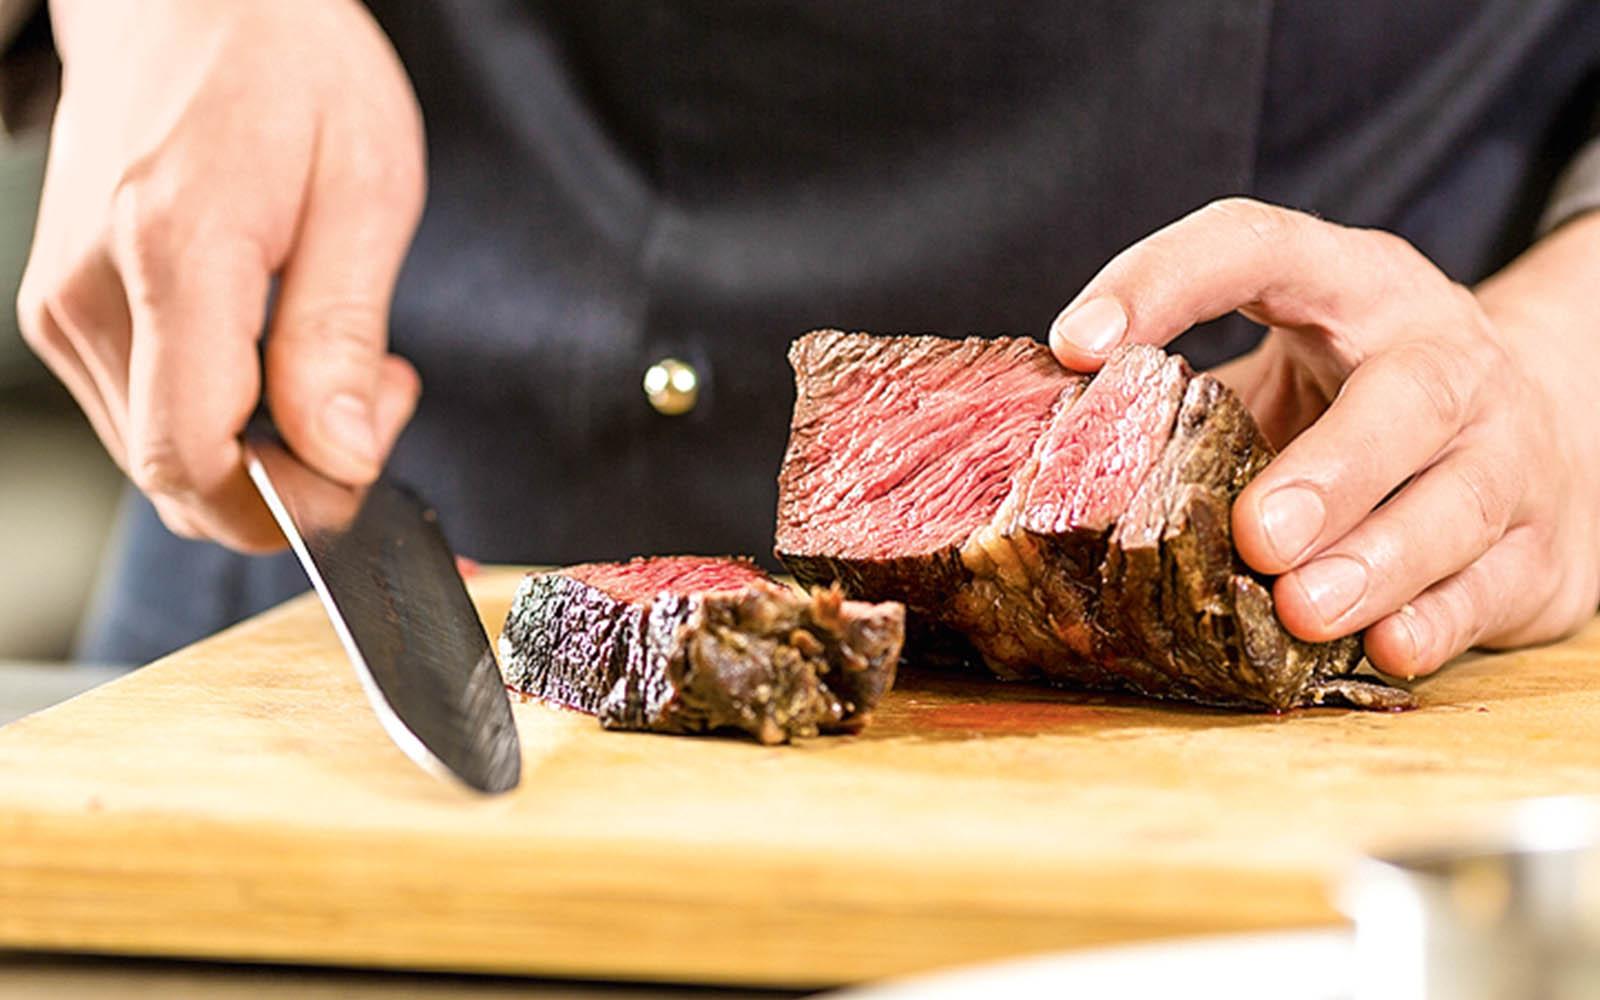 жареное мясо Макги